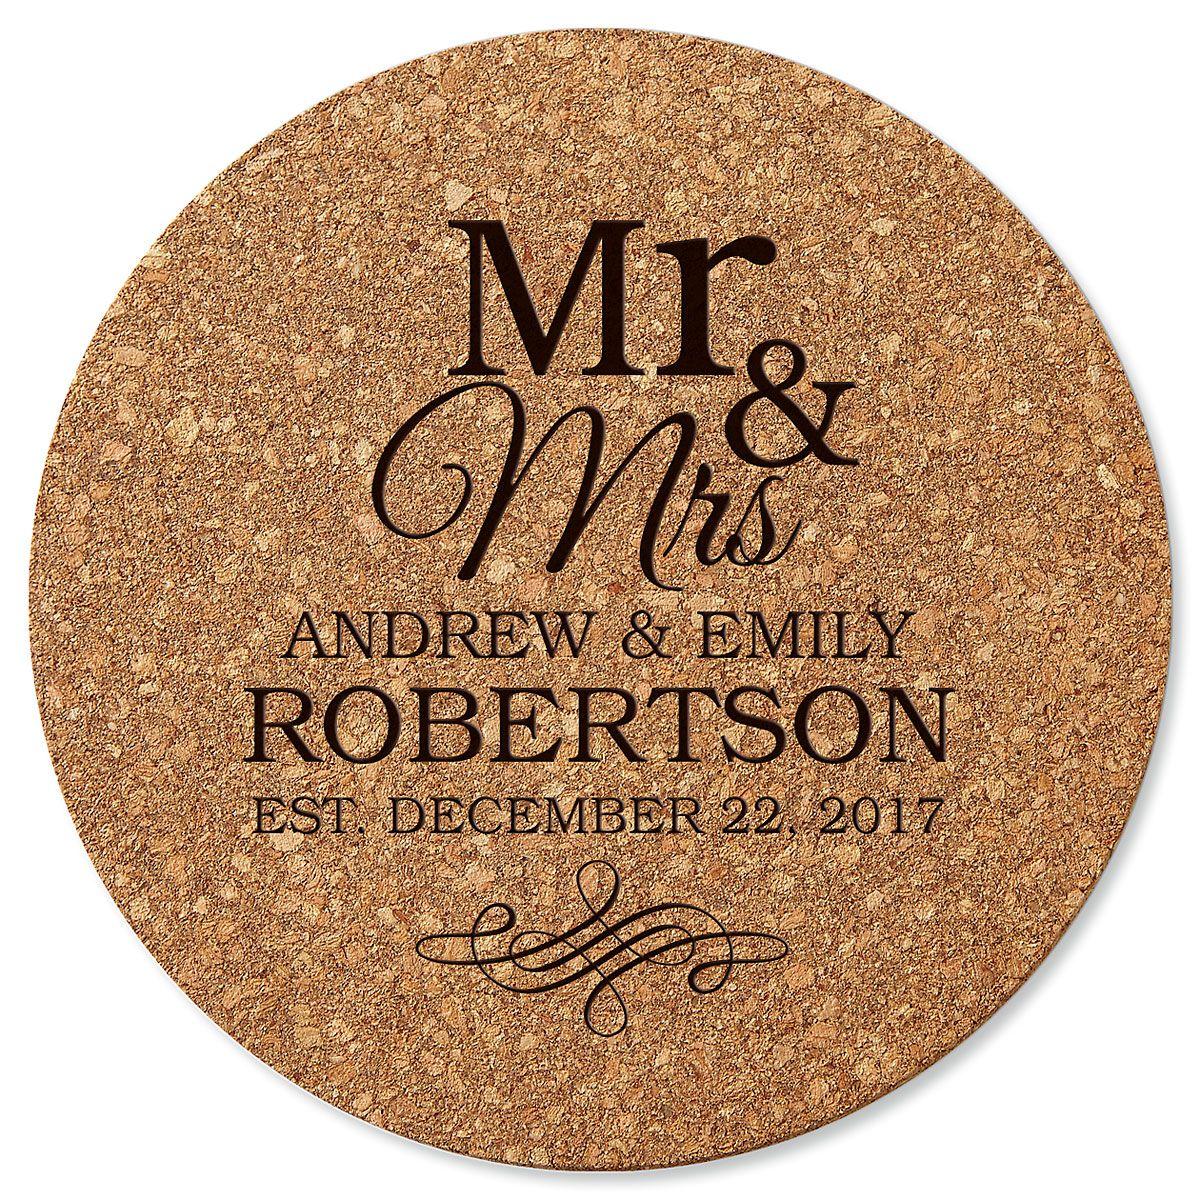 Personalized Mr. & Mrs. Round Cork Trivet by Designer Jillian Yee-Pham